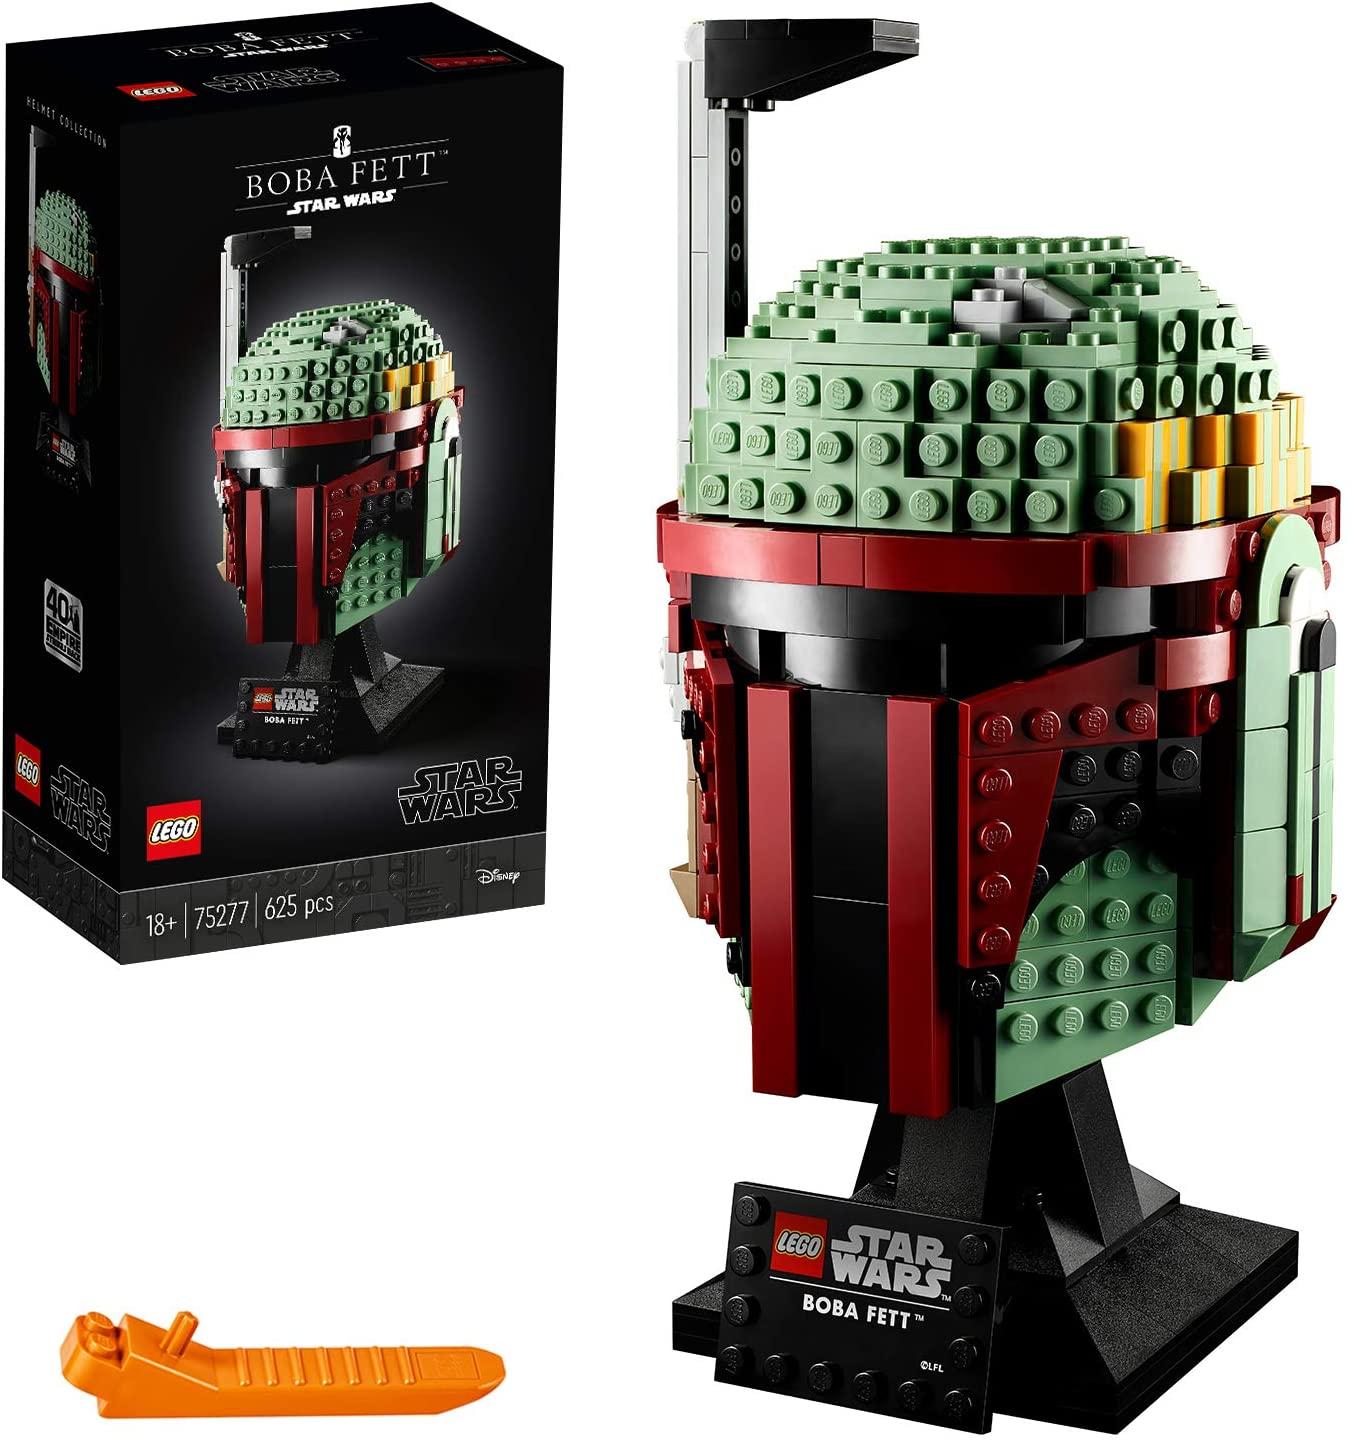 LEGO Star Wars - Casco de Boba Fett